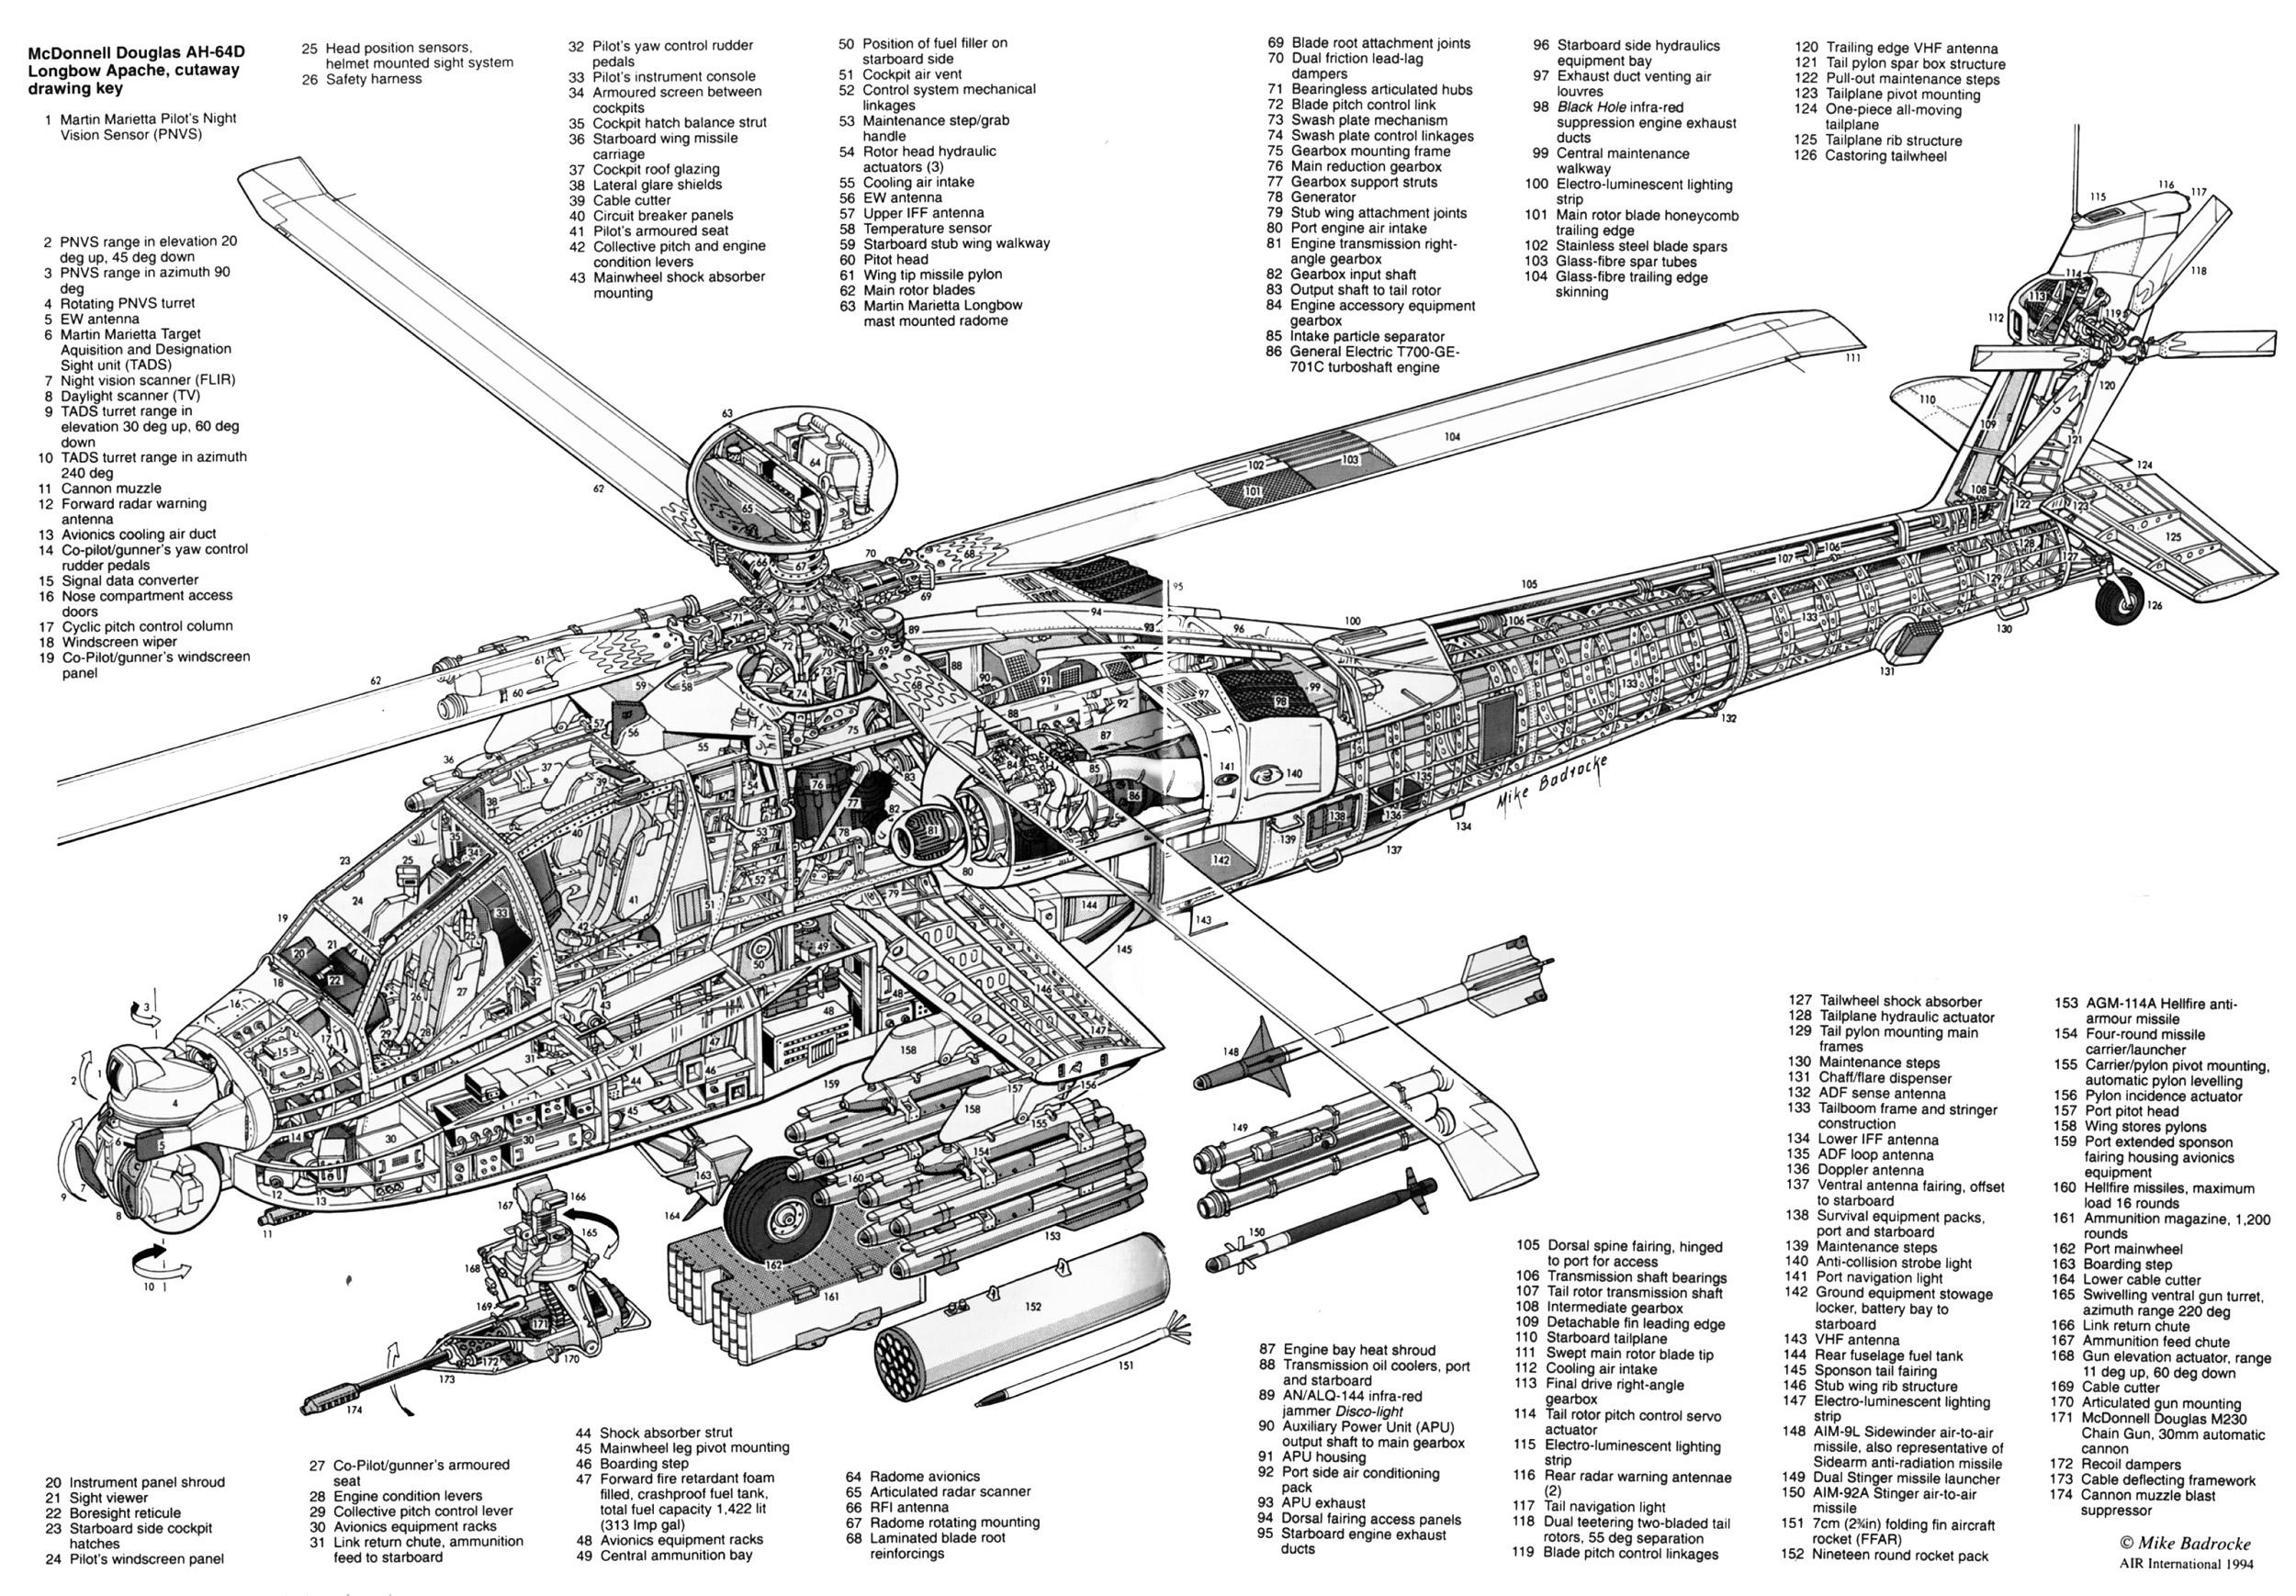 Cutaway Drawing  Diagramas Em 3d De Maquinas Mostrando Partes Internas   Fotos